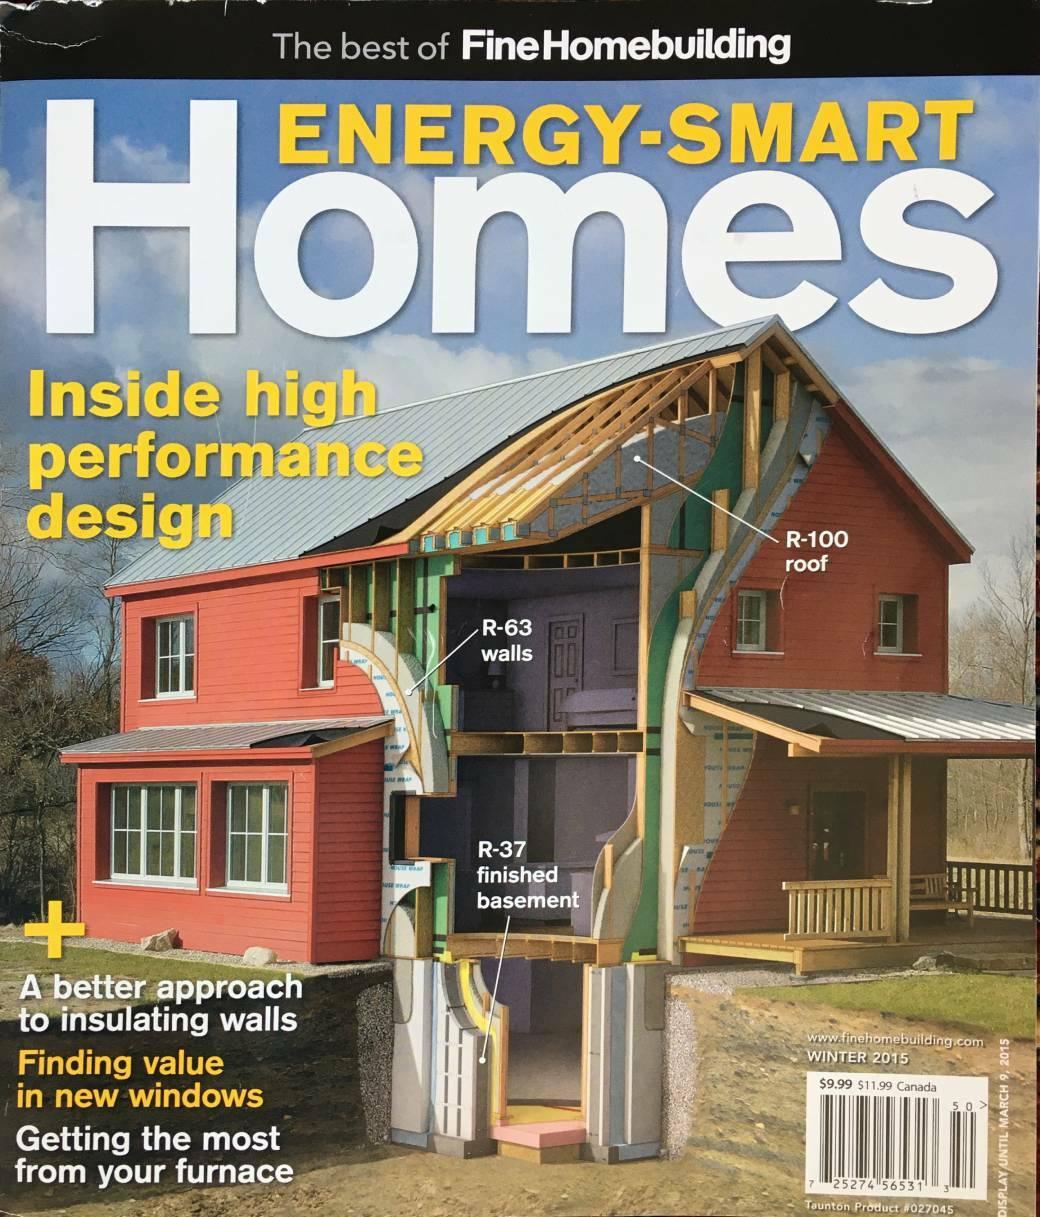 Fine Homebuilding cover